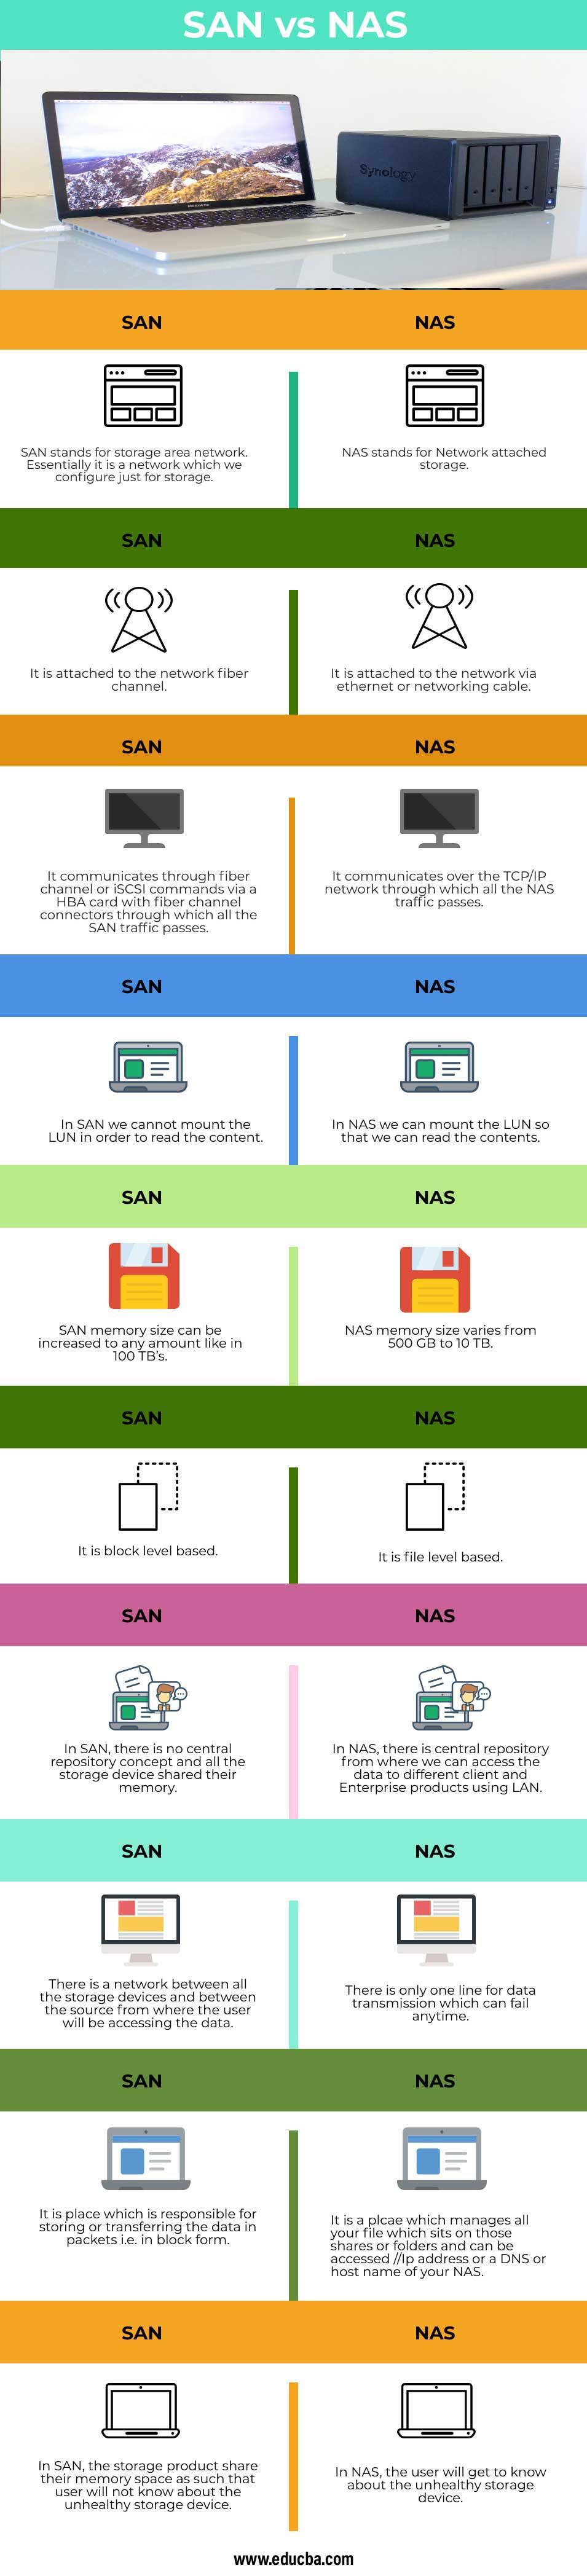 SAN-vs-NAS-info